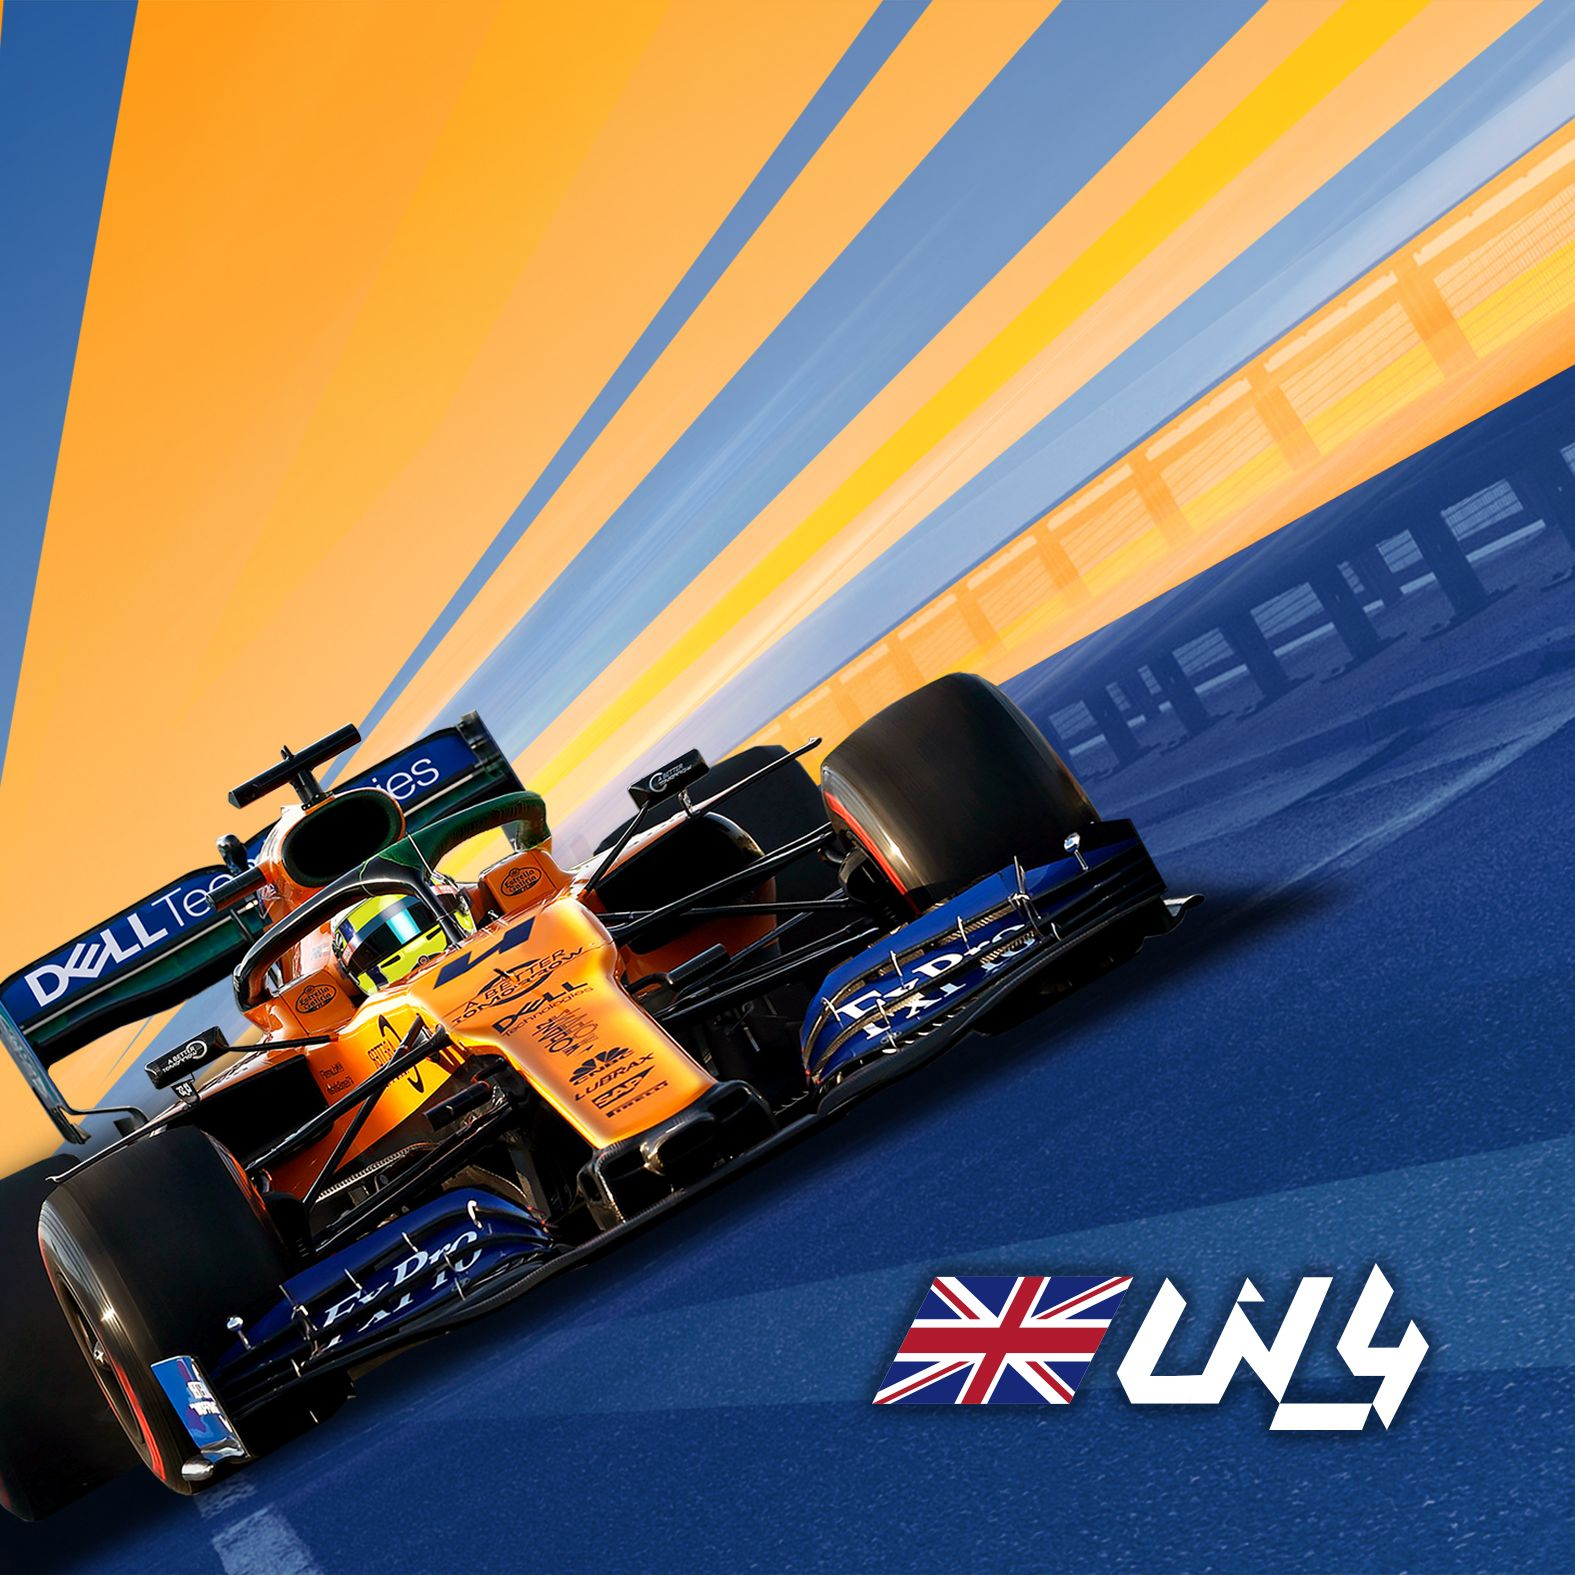 Pin by Alex PRO on Formula 1 2019 Formula 1 car F1 motorsport 1575x1575